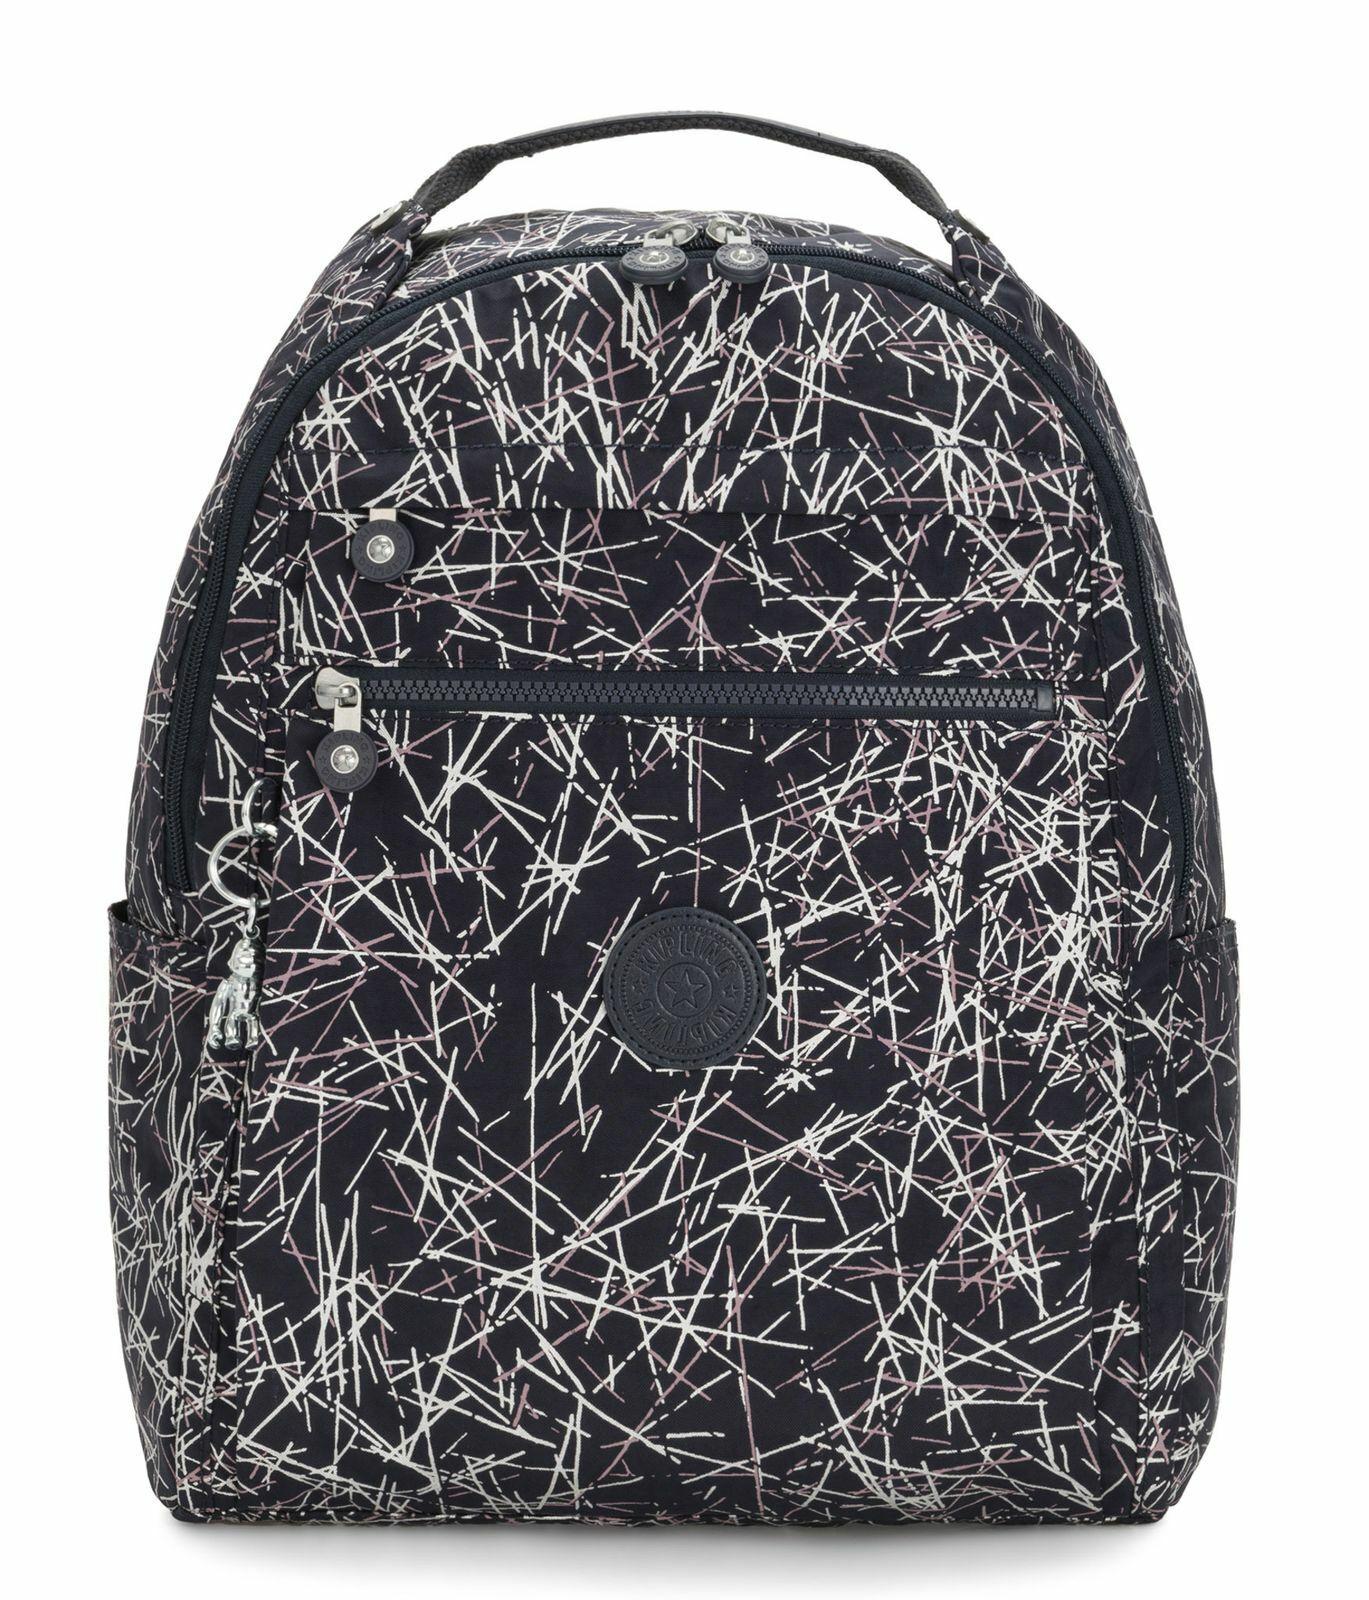 Kipling Micah Medium Backpack Navy Stick Print